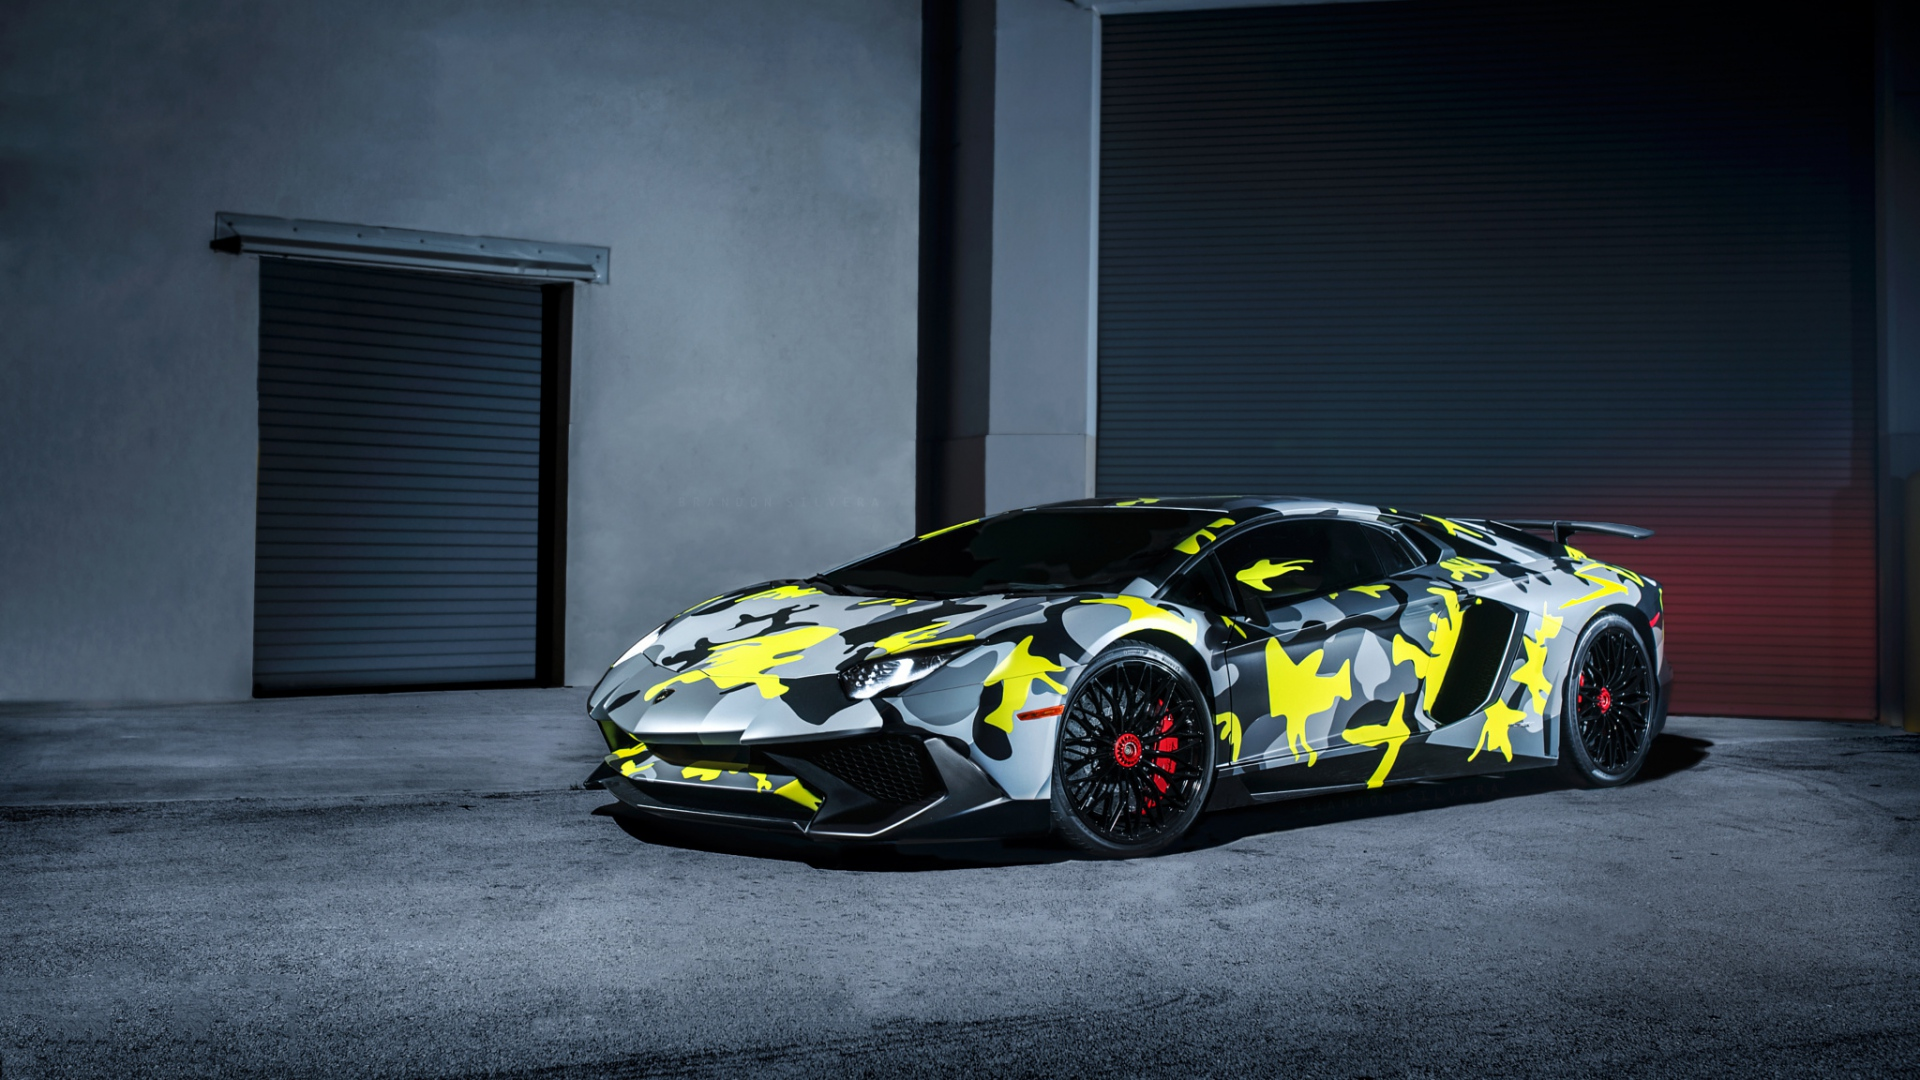 Lamborghini-Aventador-lp-1920x1080-Need-iPhone-S-Plus-Background-for-IPhone-wallpaper-wp3607797